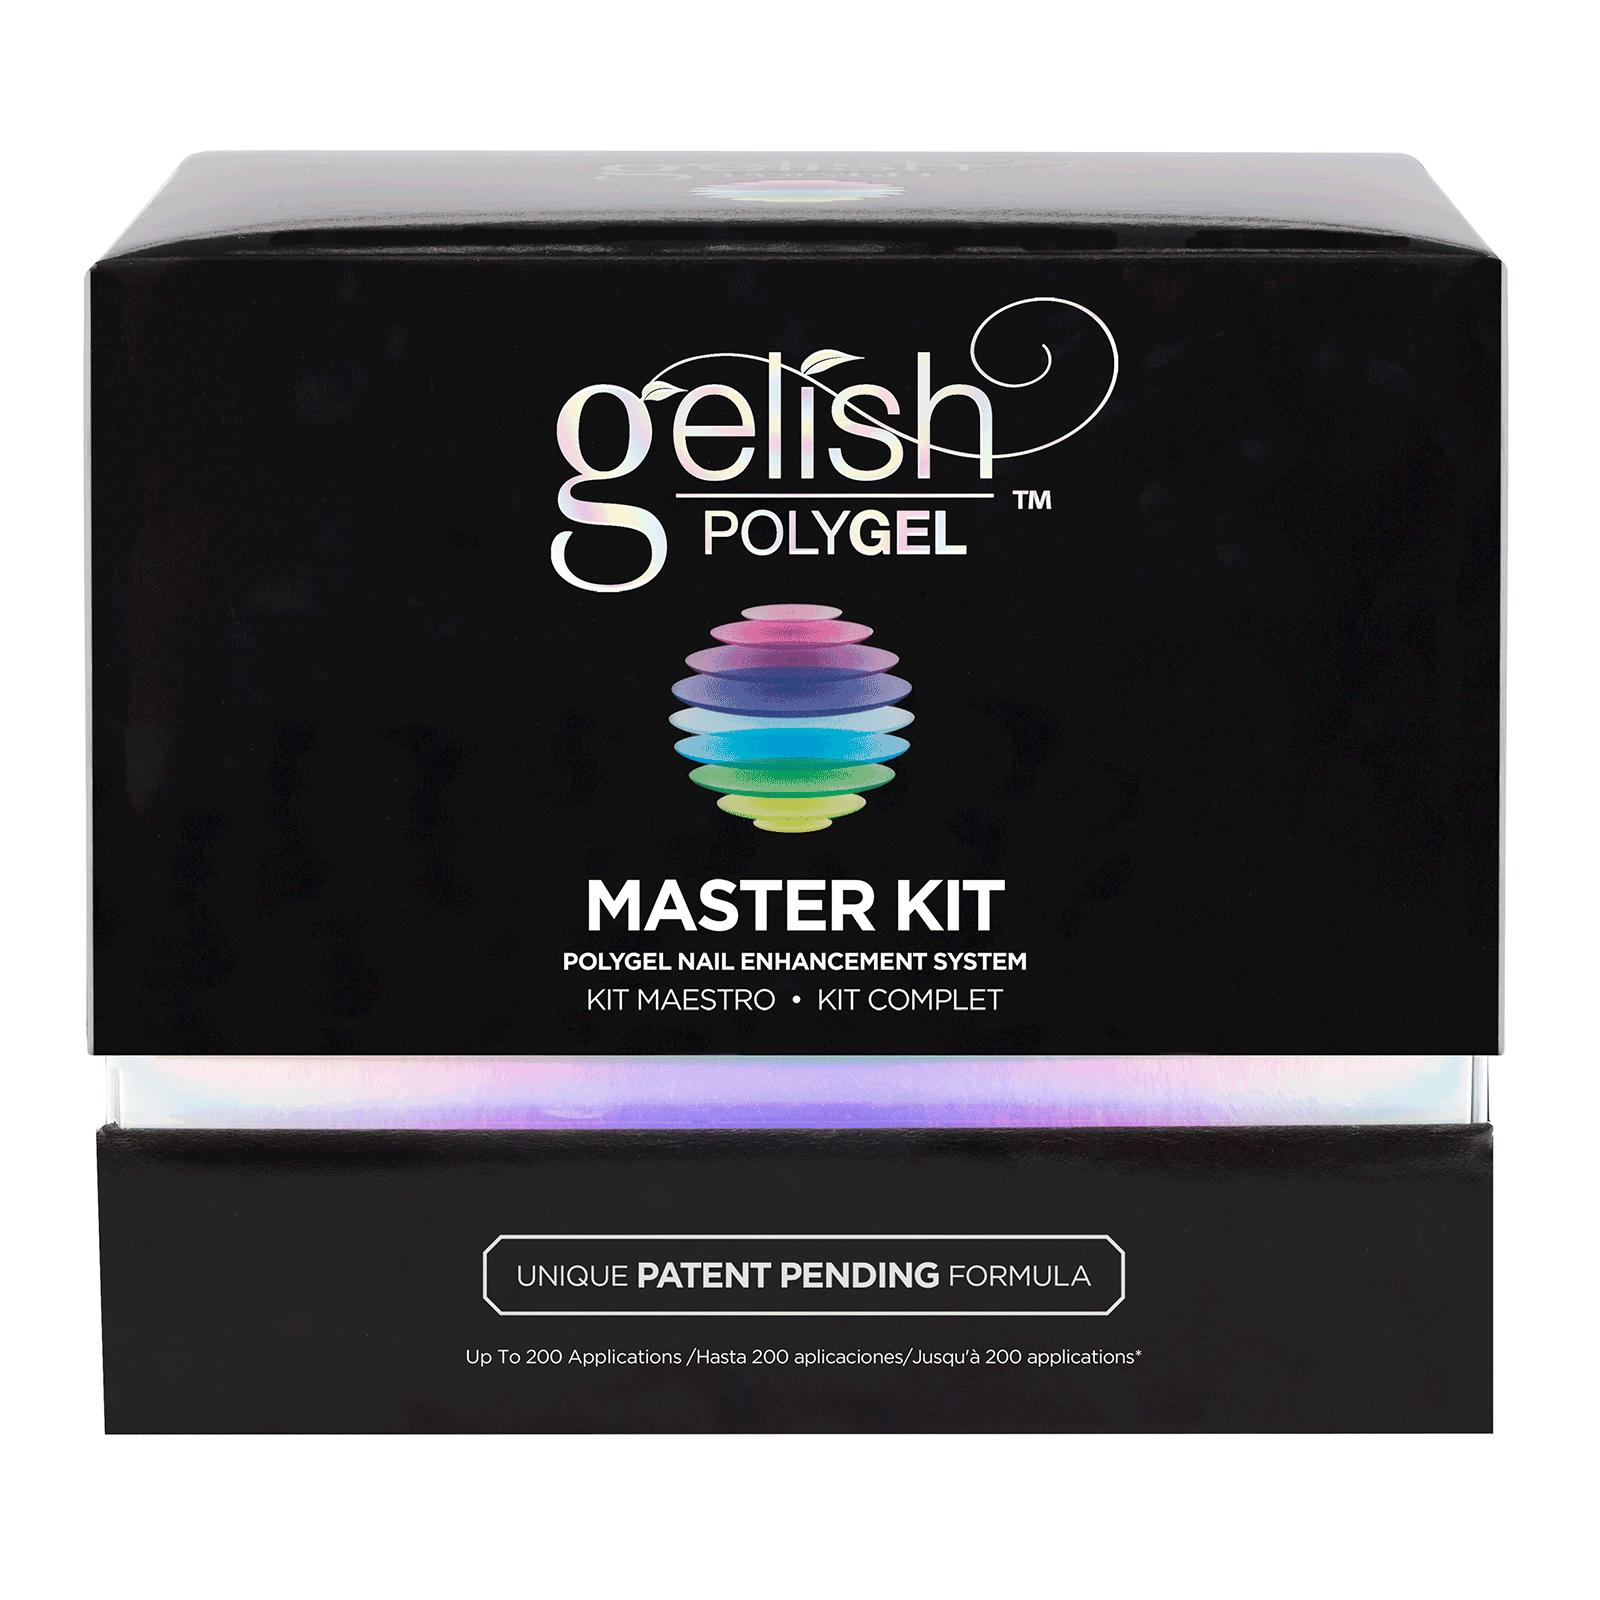 Polygel Master Kit Gelish Polygel Gelish Gel Nail Polish Nail Polish Kits